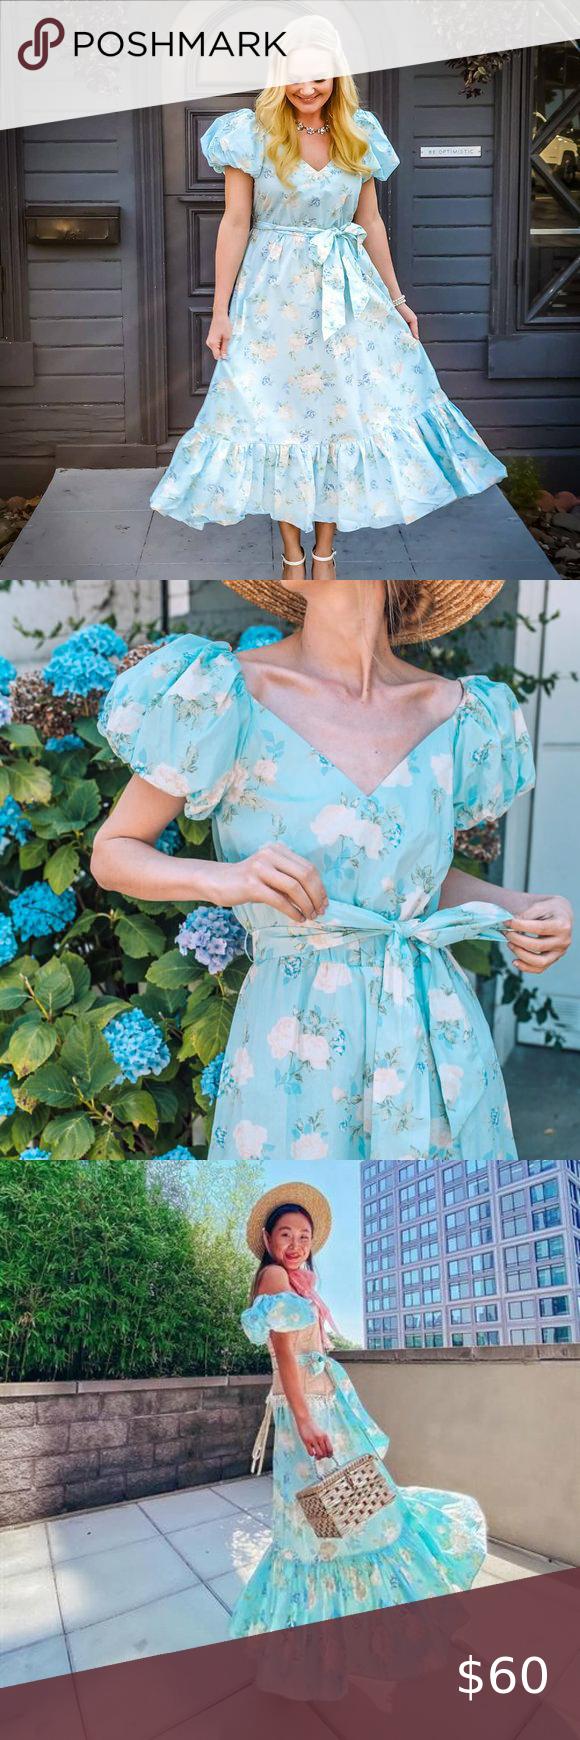 Nwt Target Loveshackfancy Estelle Floral Dress 12 Blue Floral Puff Sleeve Belted Dress Cottag Floral Blue Dress Floral Print Dress Long Floral Print Maxi Dress [ 1740 x 580 Pixel ]